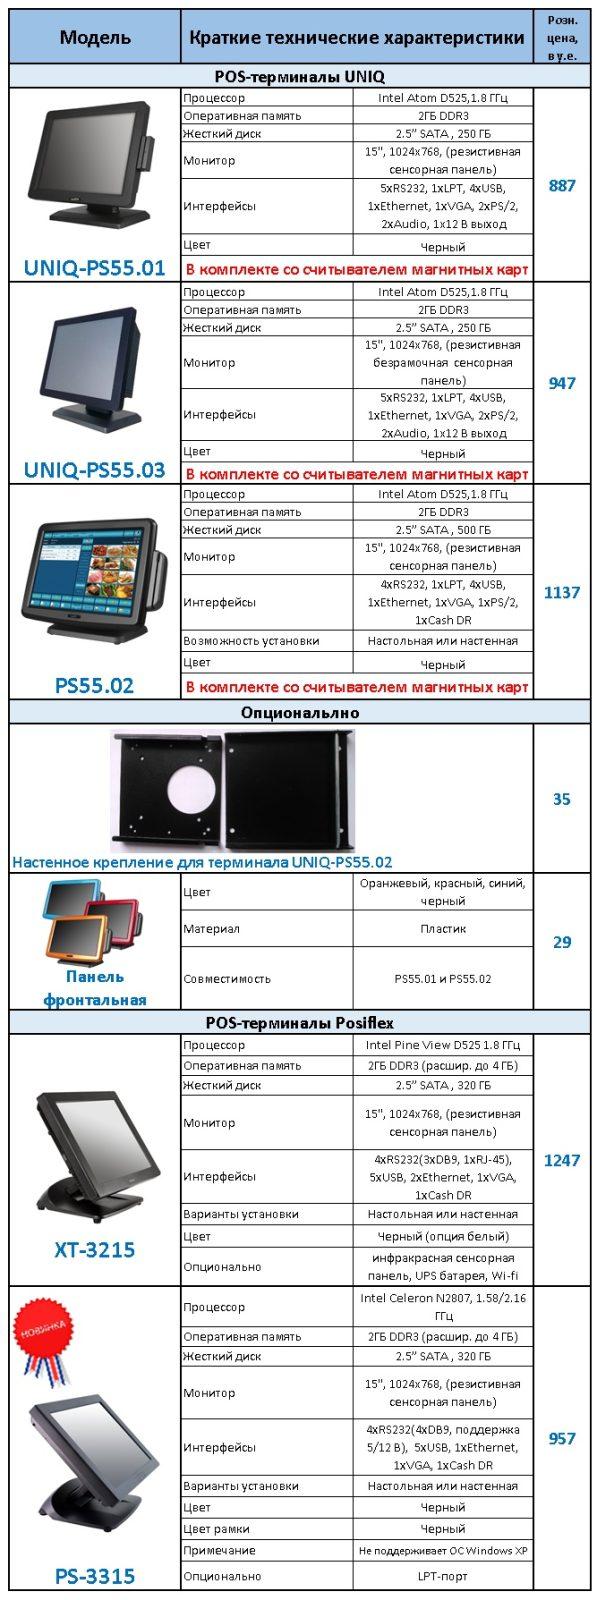 POS терминалы Uniq и POS терминалы Posiflex